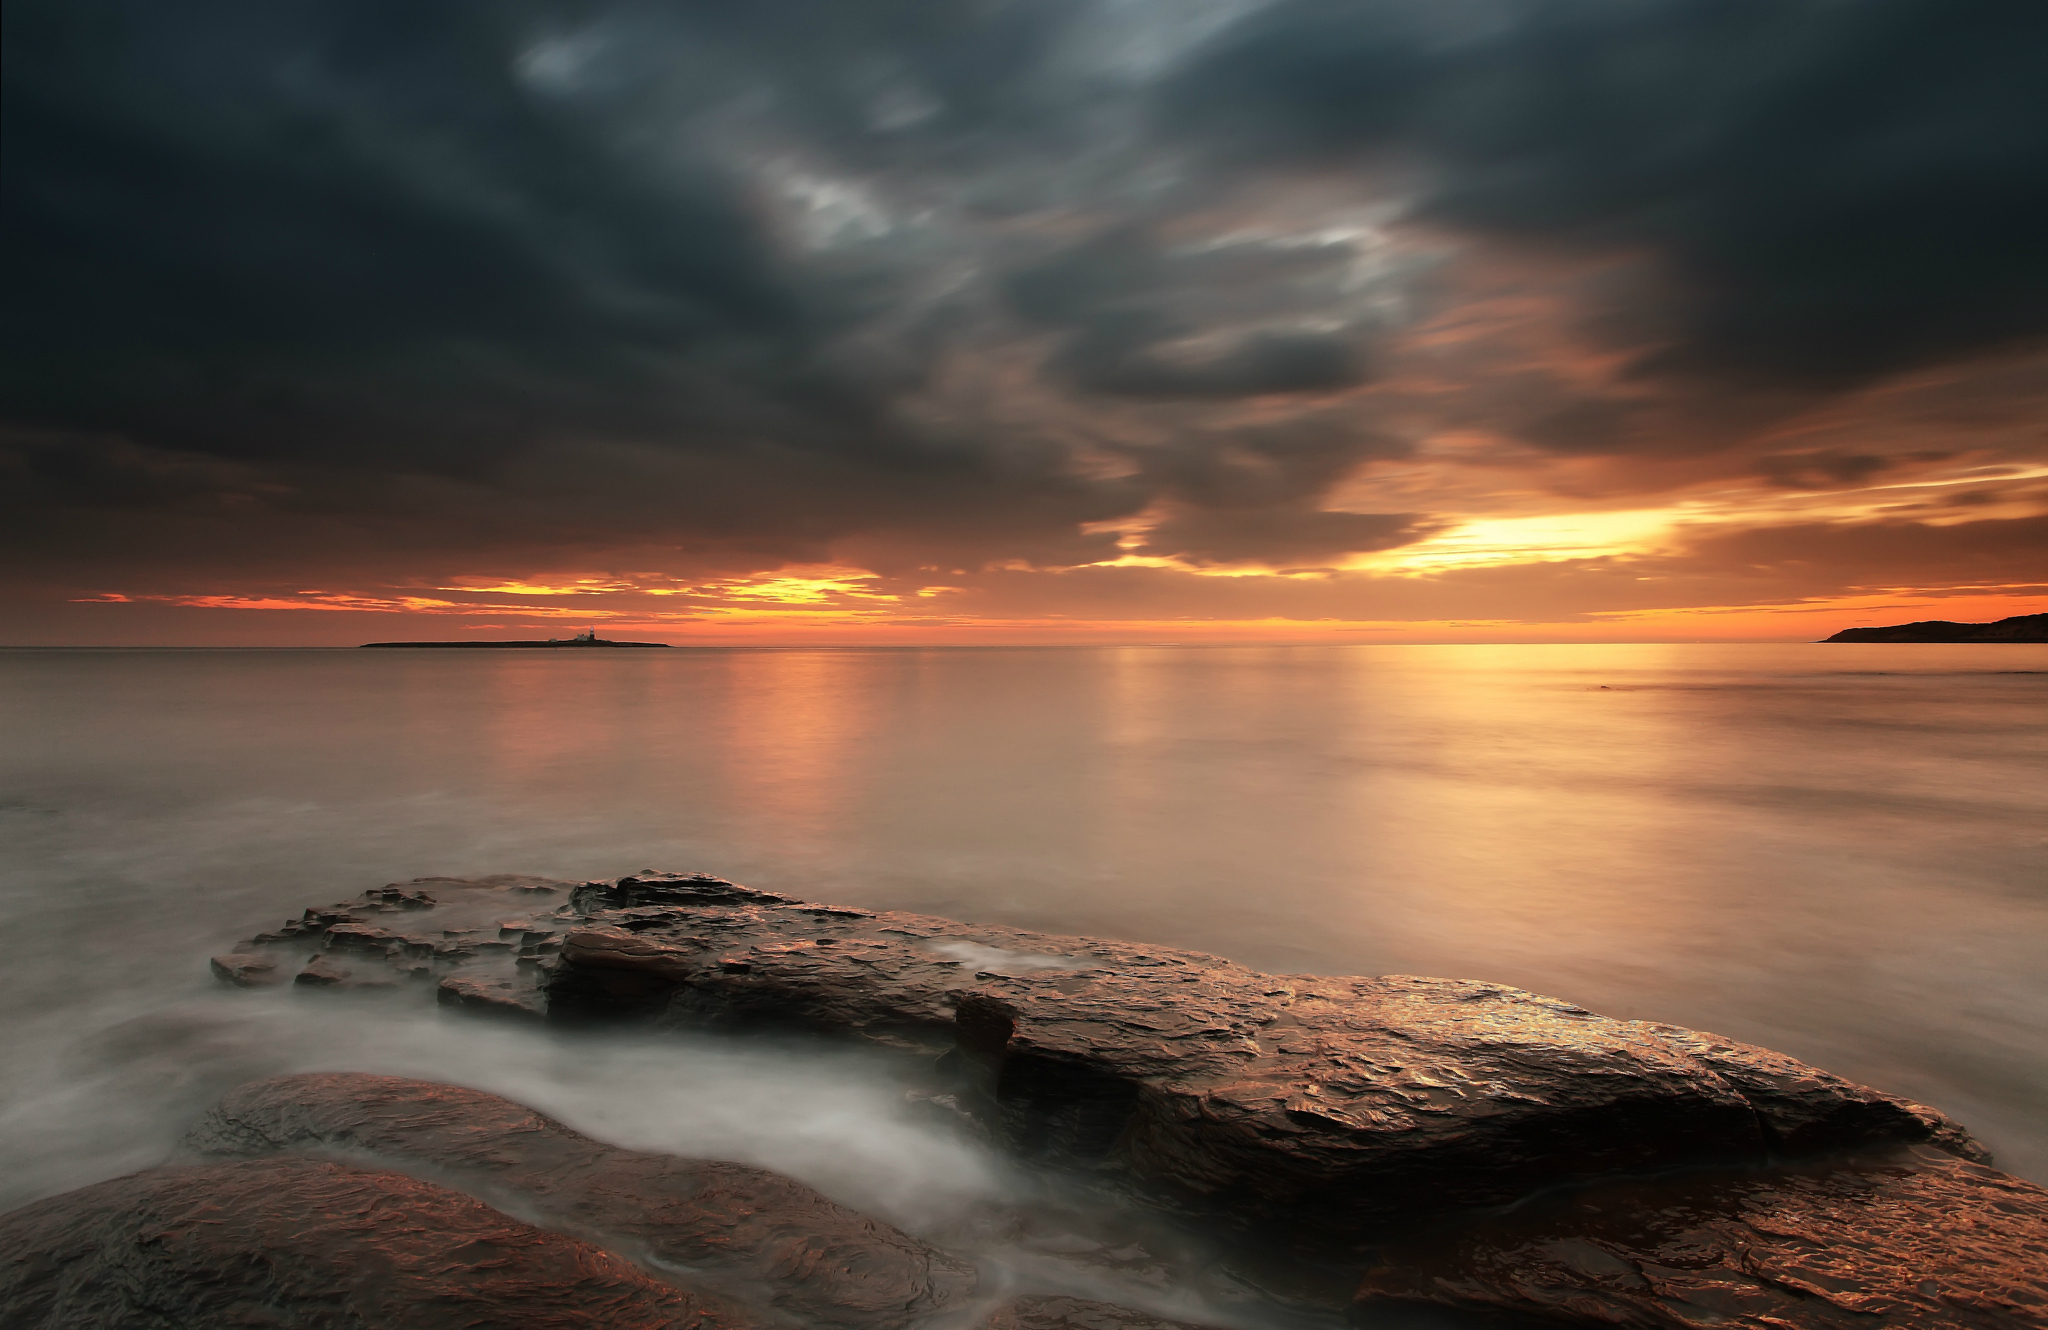 закат камень берег море sunset stone shore sea  № 1023653 бесплатно